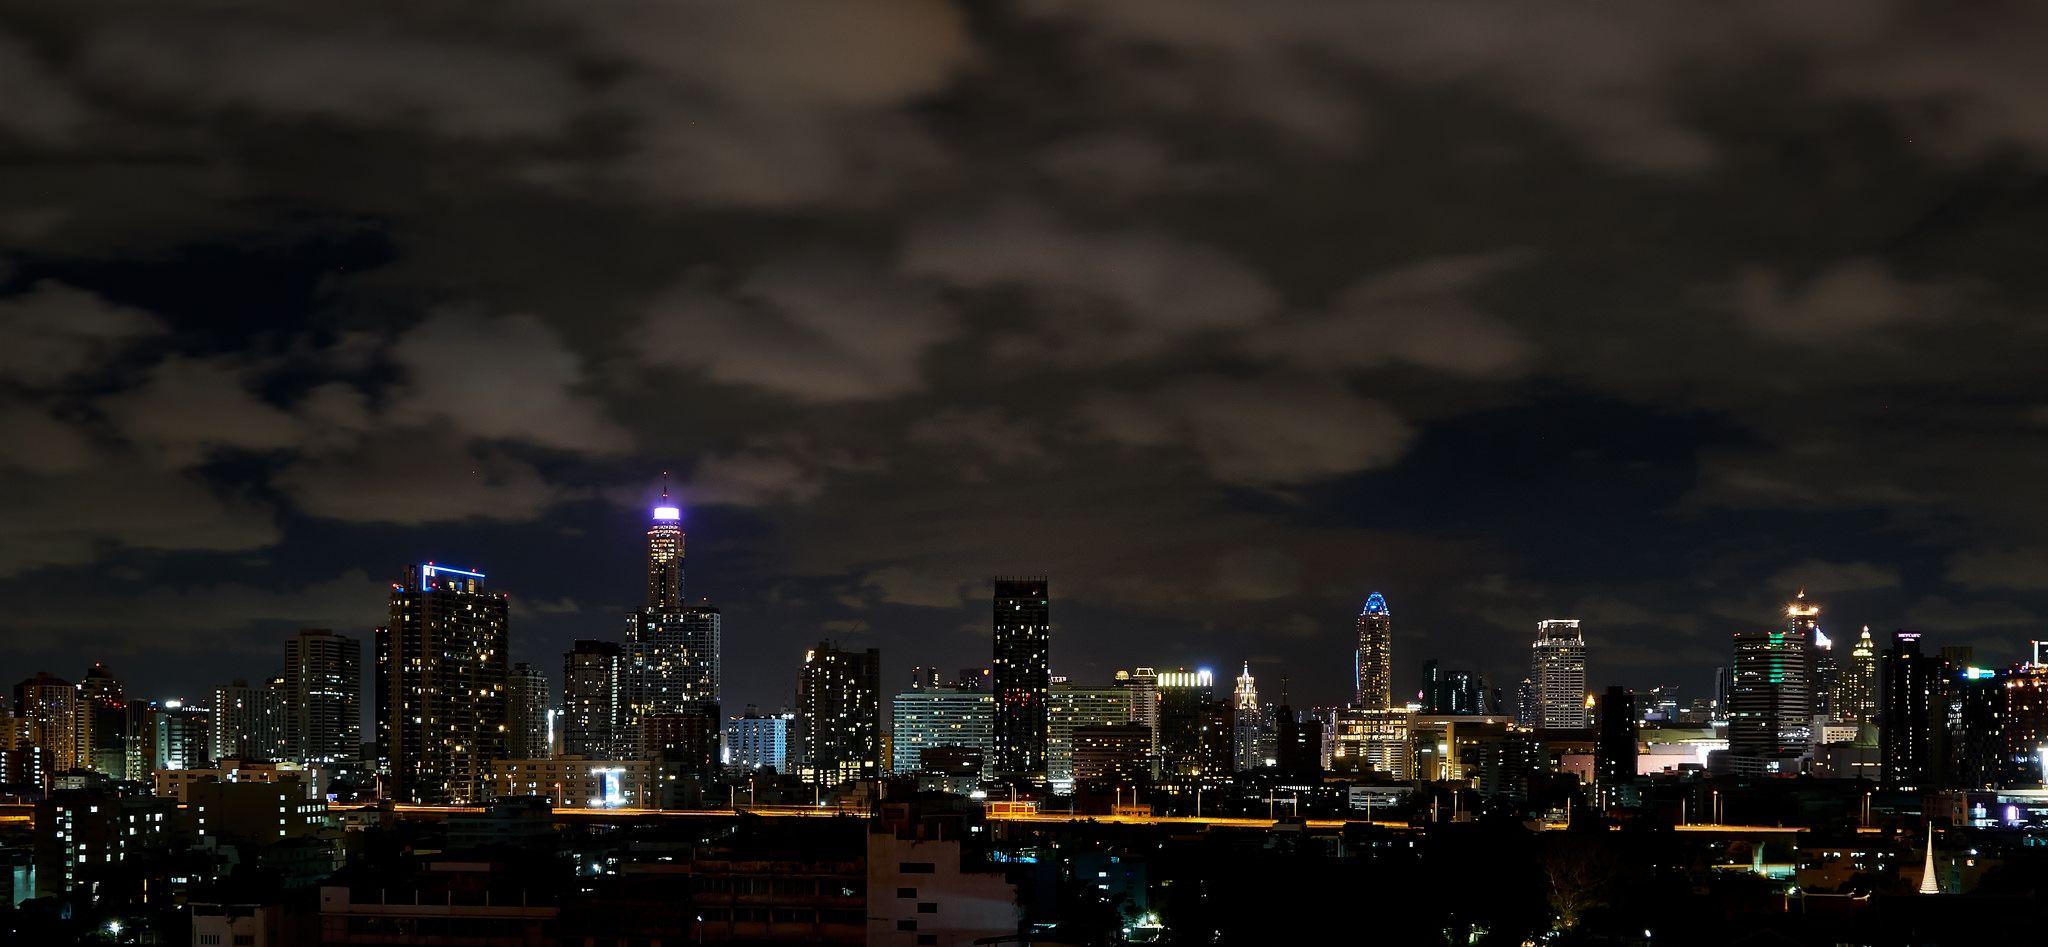 https://flic.kr/p/wyD14q | Bangkok skyline | At night